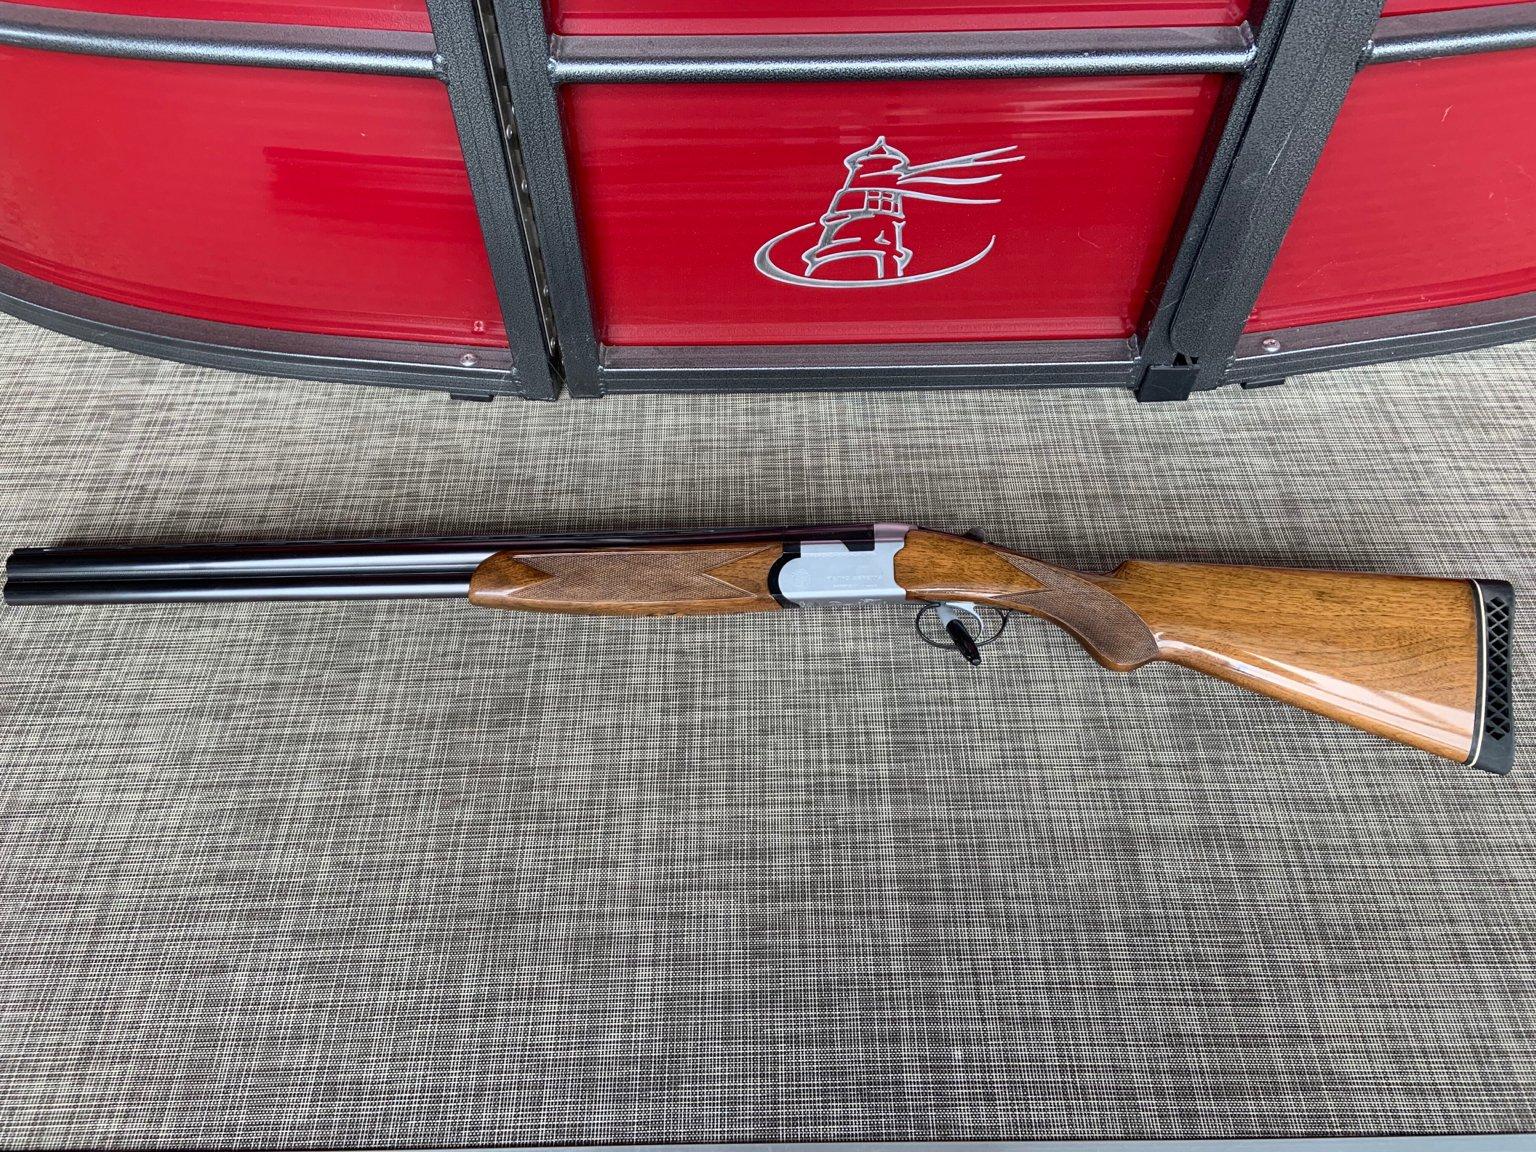 Help Identifying Beretta O/U | Arkansas Hunting - Your